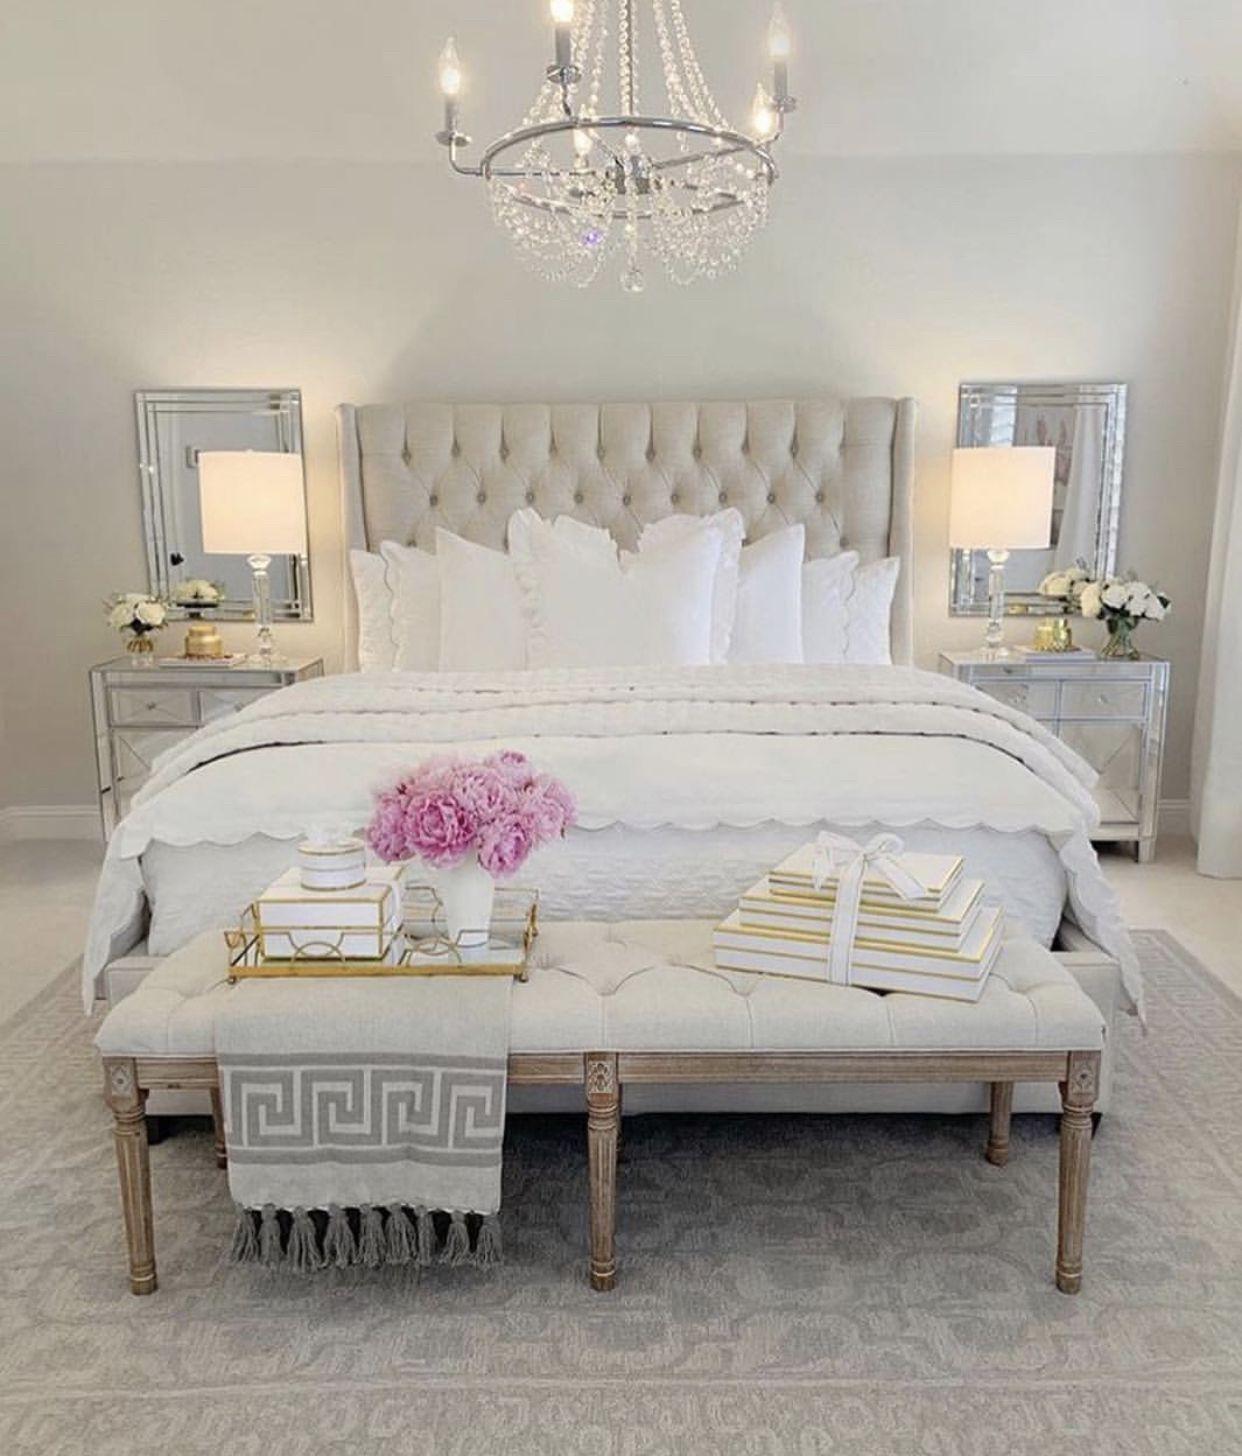 Pinterest Sarah Baker Classy Bedroom Glam Decor Master Bedrooms